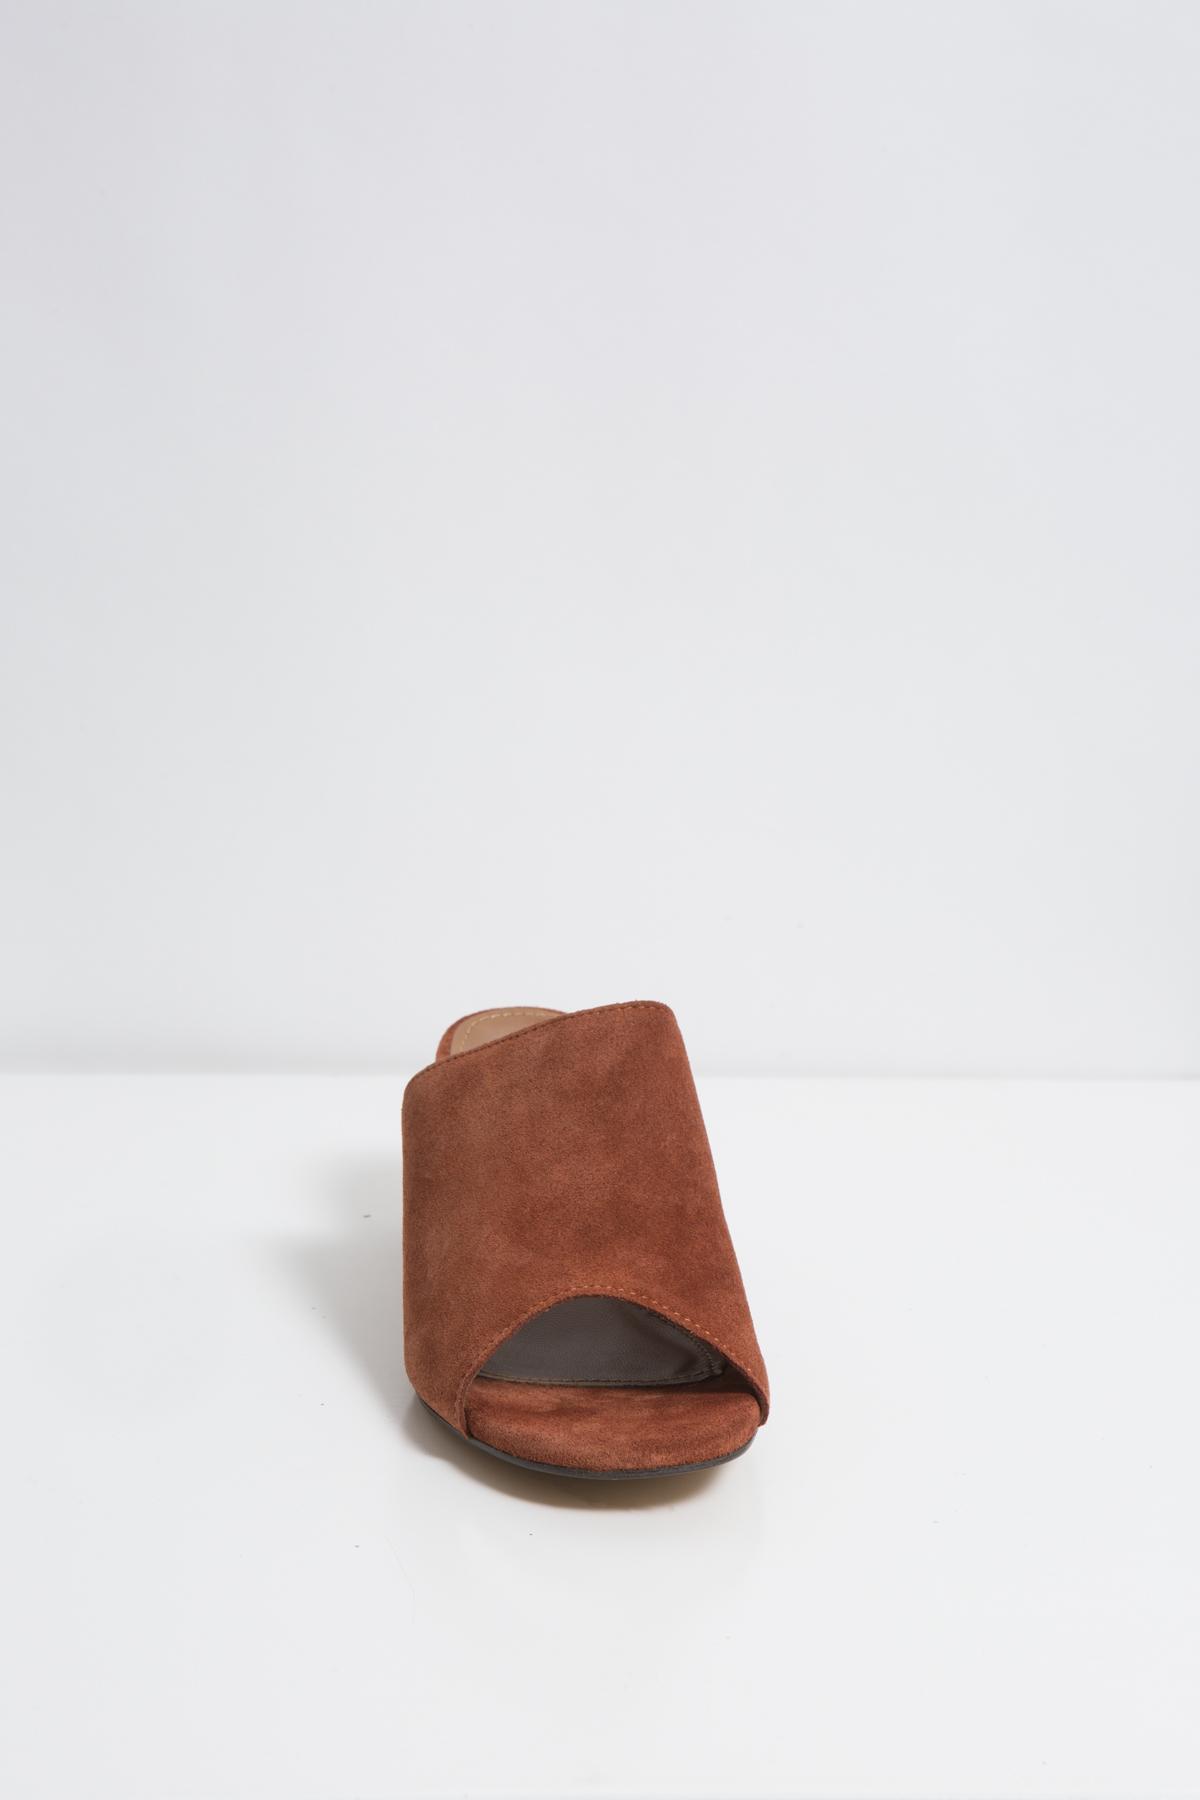 horizon-clay-mules-anthology-paris-suede-matchboxathens